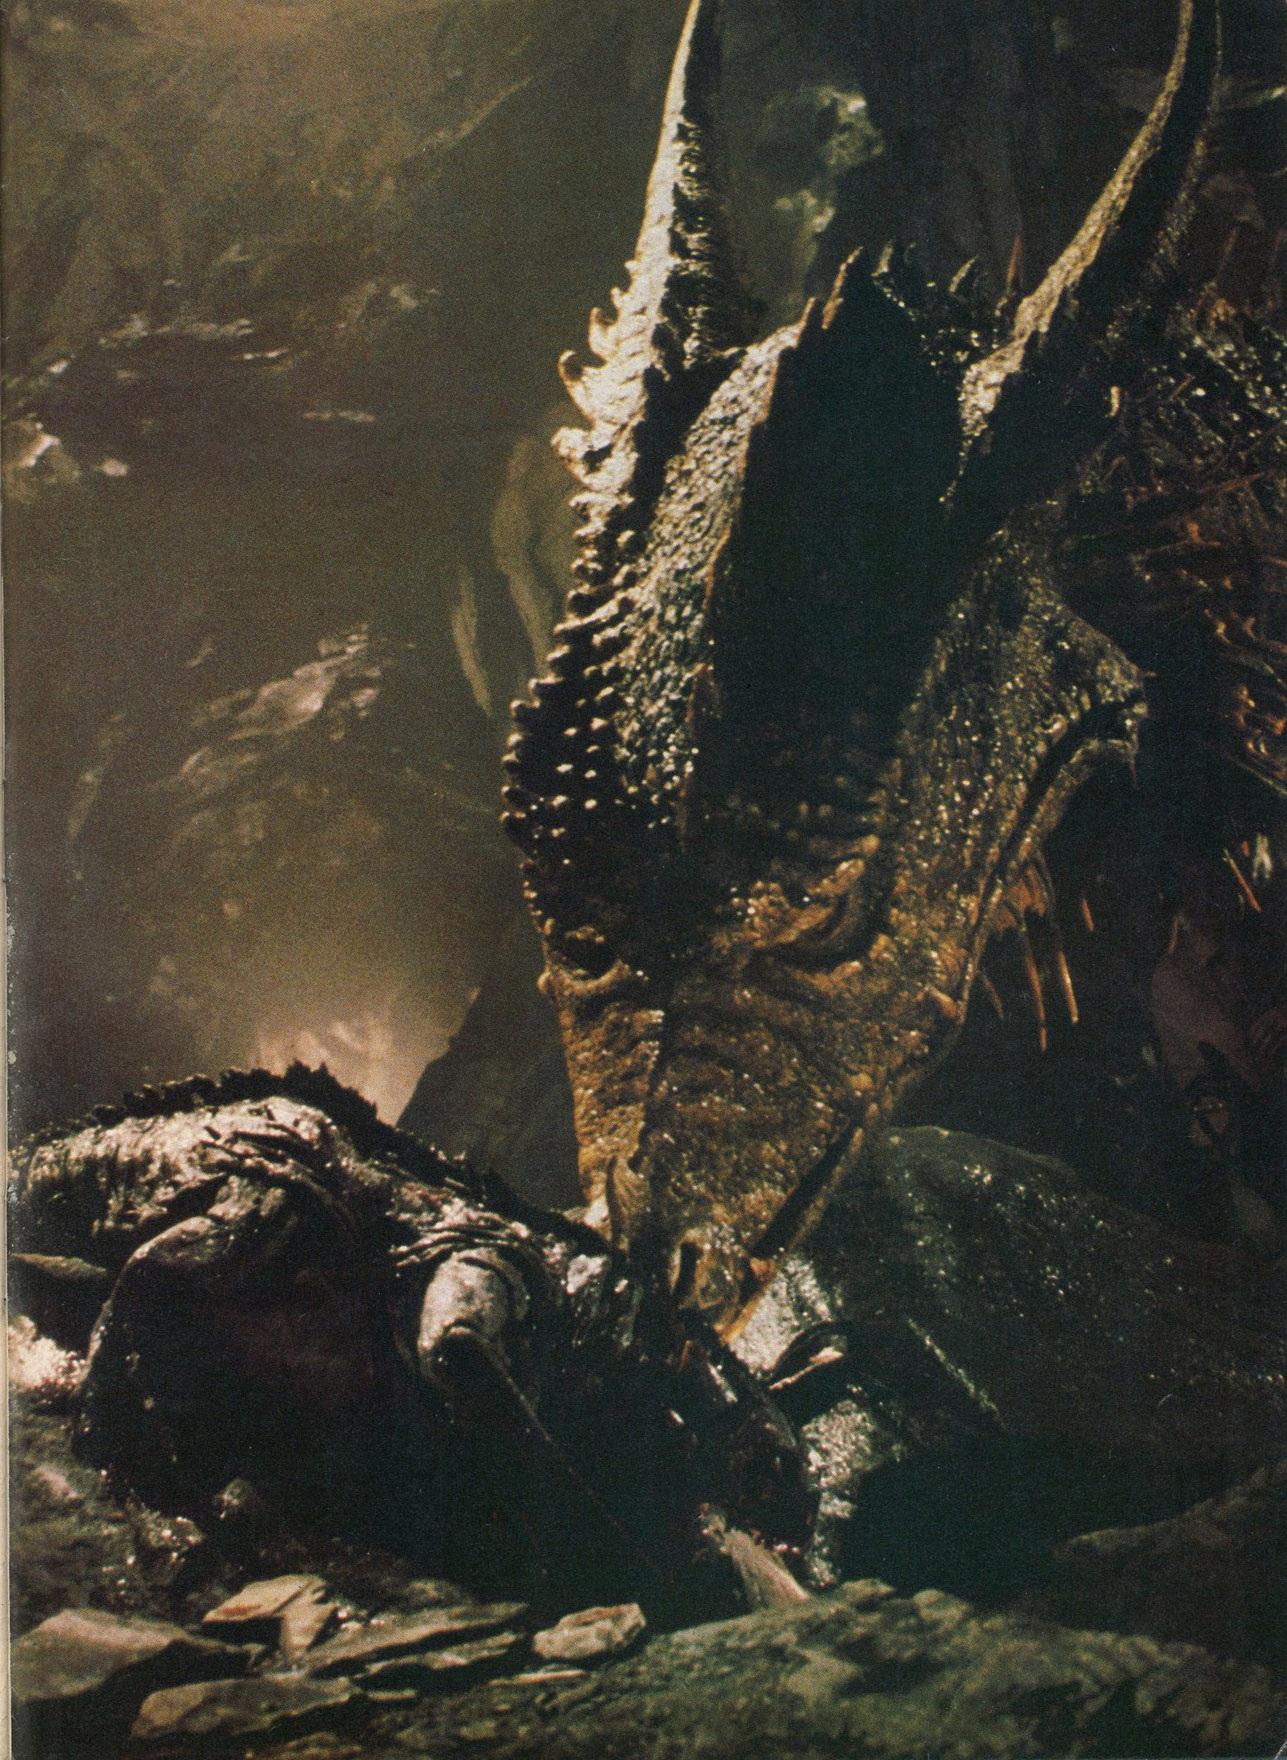 monster gallery dragonslayer 1981 monster legacy